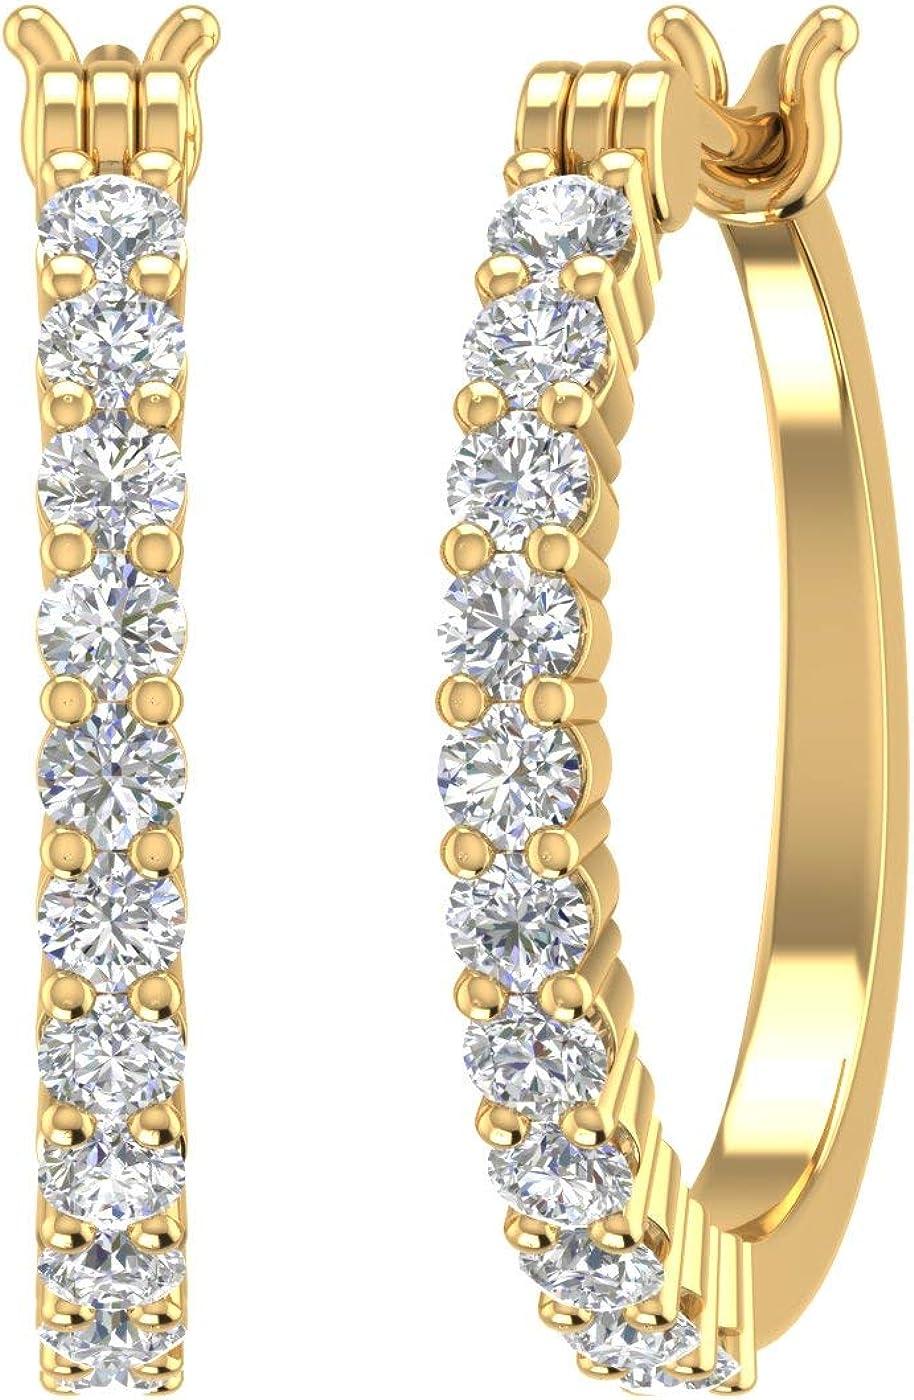 1/4 Carat to 3/4 Carat Natural Diamond Hoop Earrings in 10K Gold